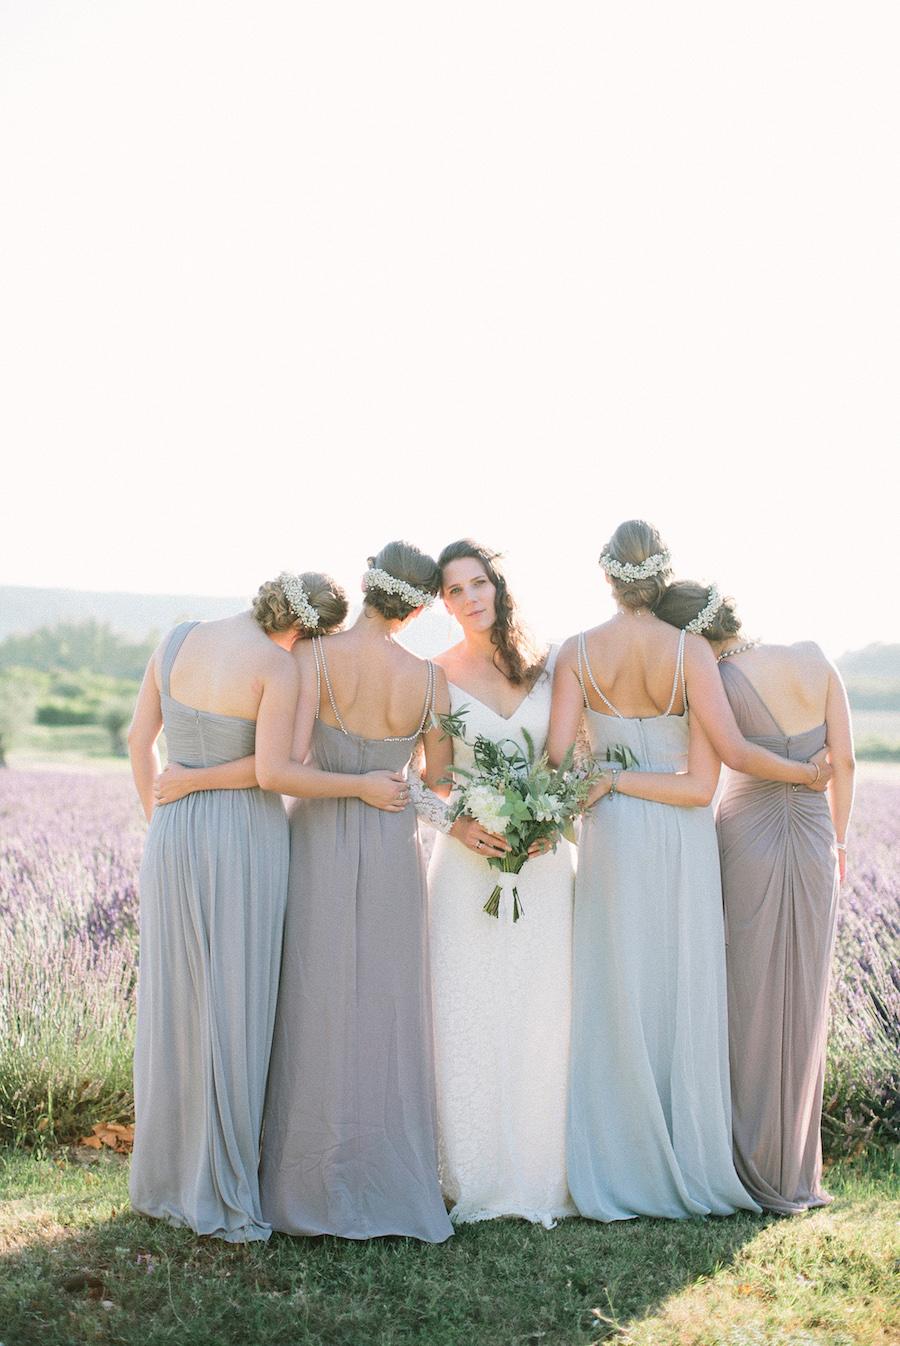 saya-photography-rustic-french-wedding-provence-domaines-de-patras-90.jpg